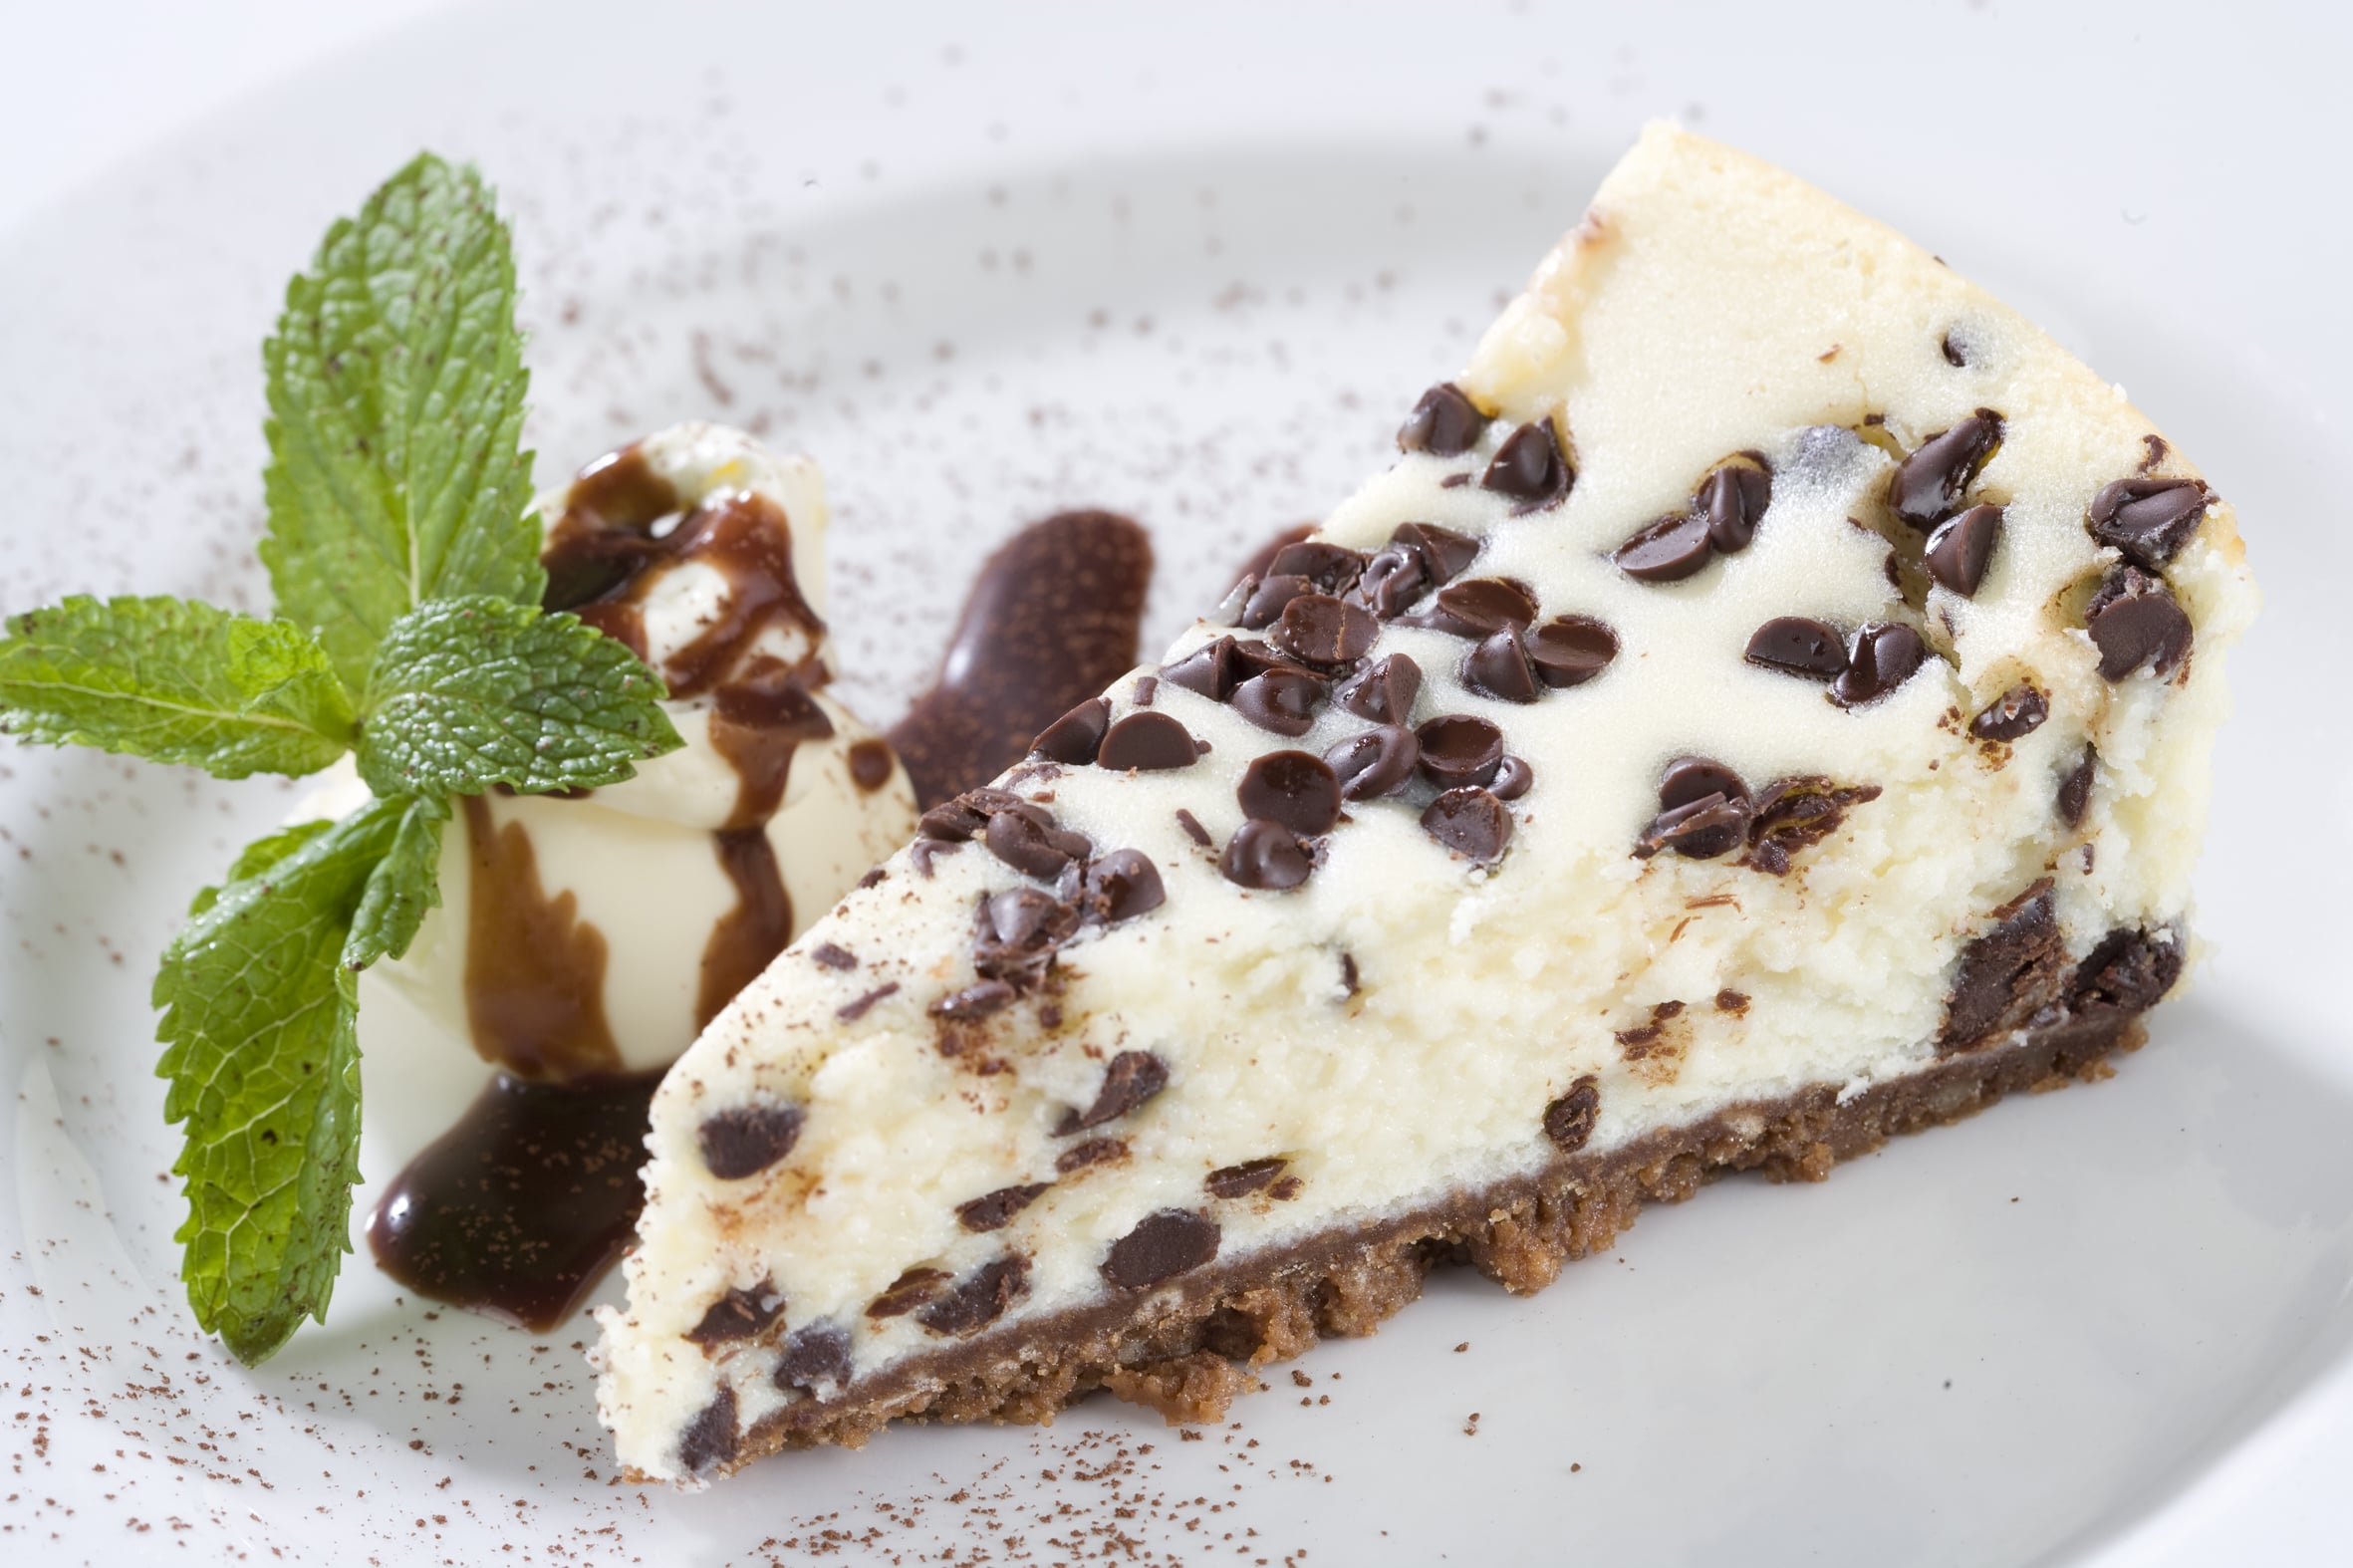 The Skinny Chef Desserts - Chocolate Chip Cheesecake